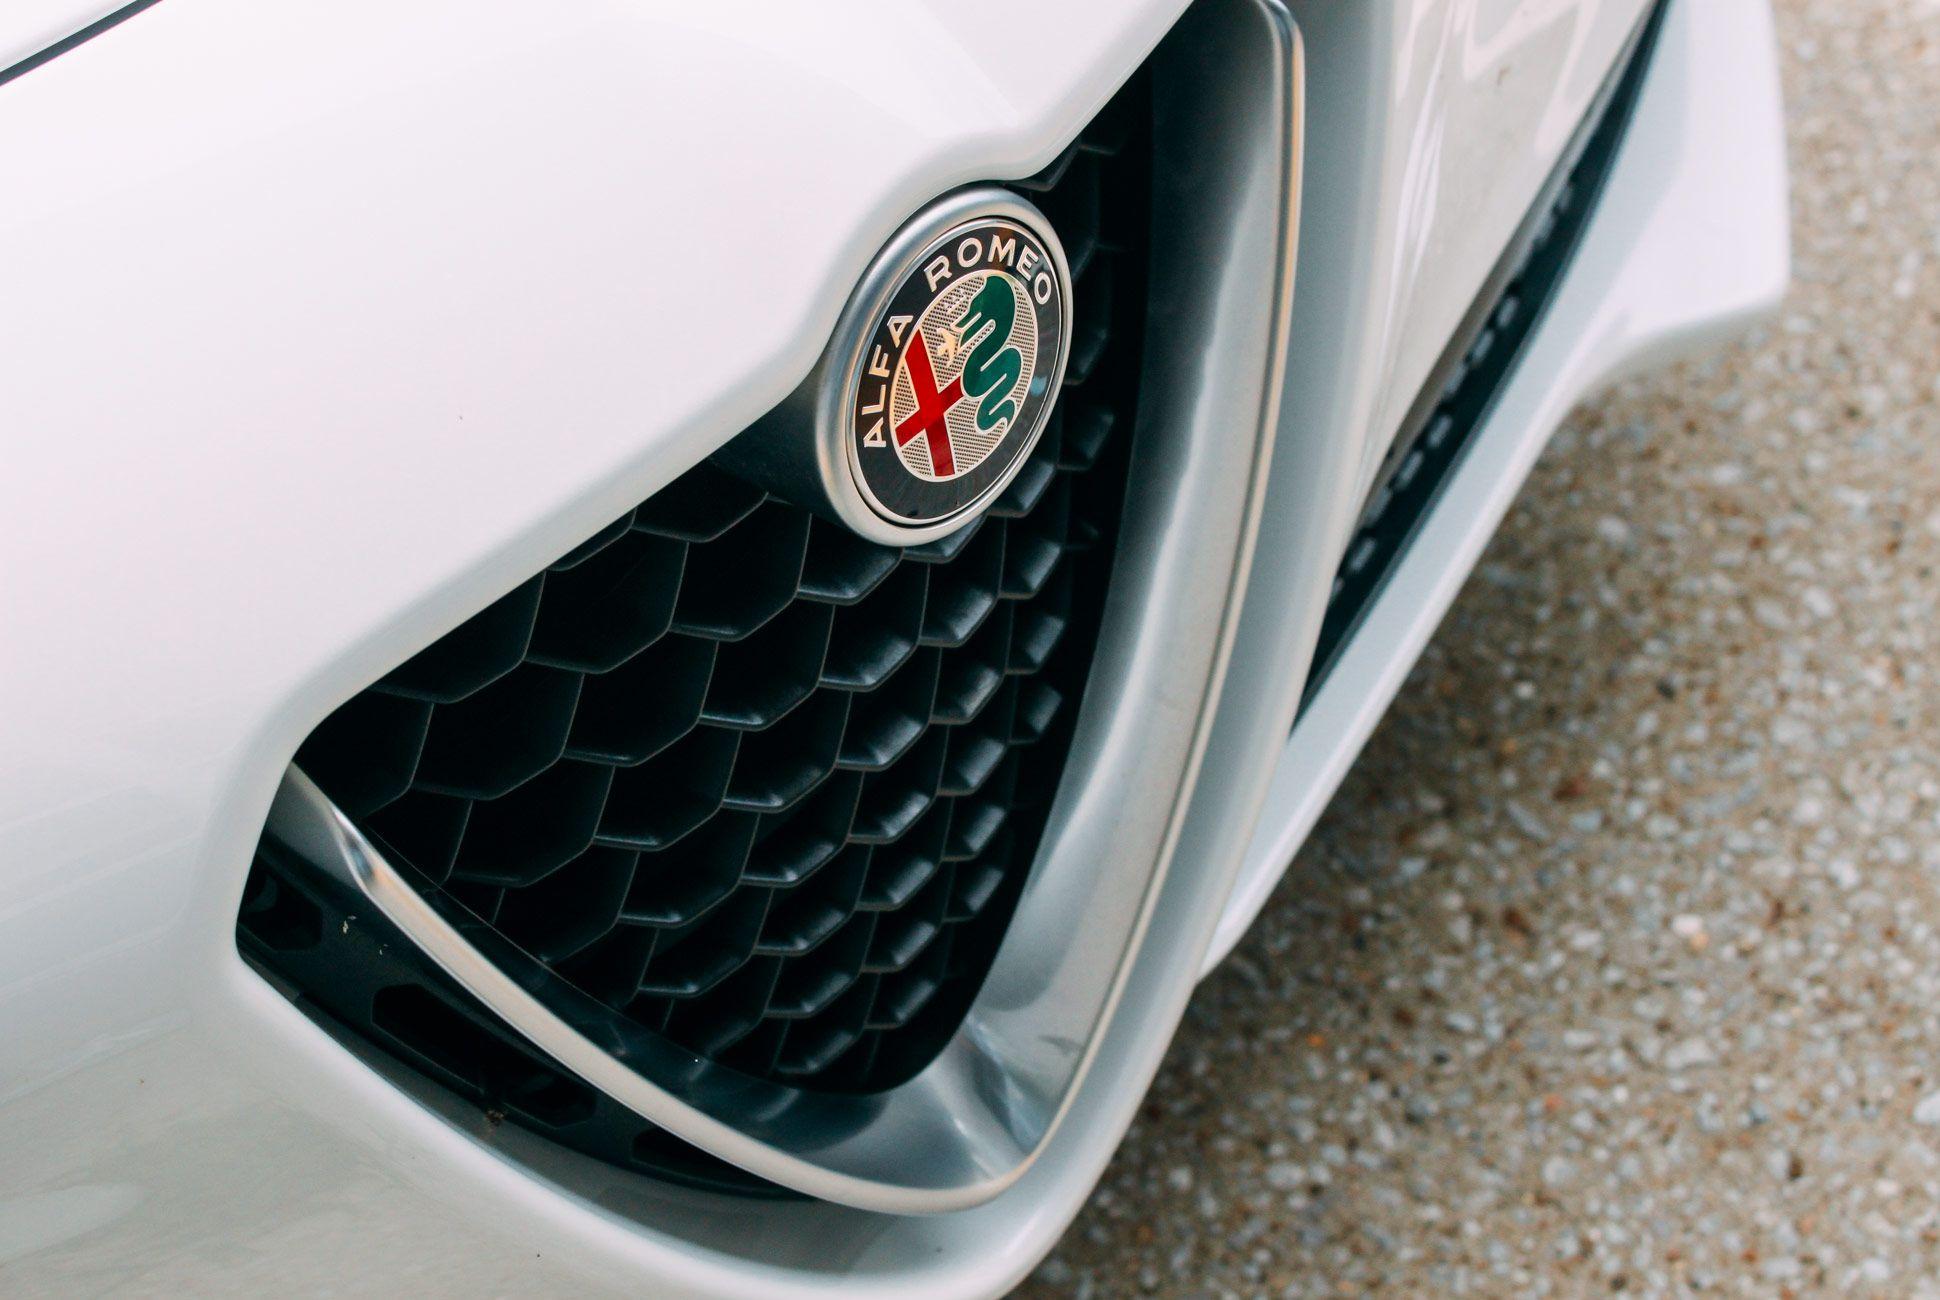 Alfa-Stelvio-Gear-Patrol-Slide-3